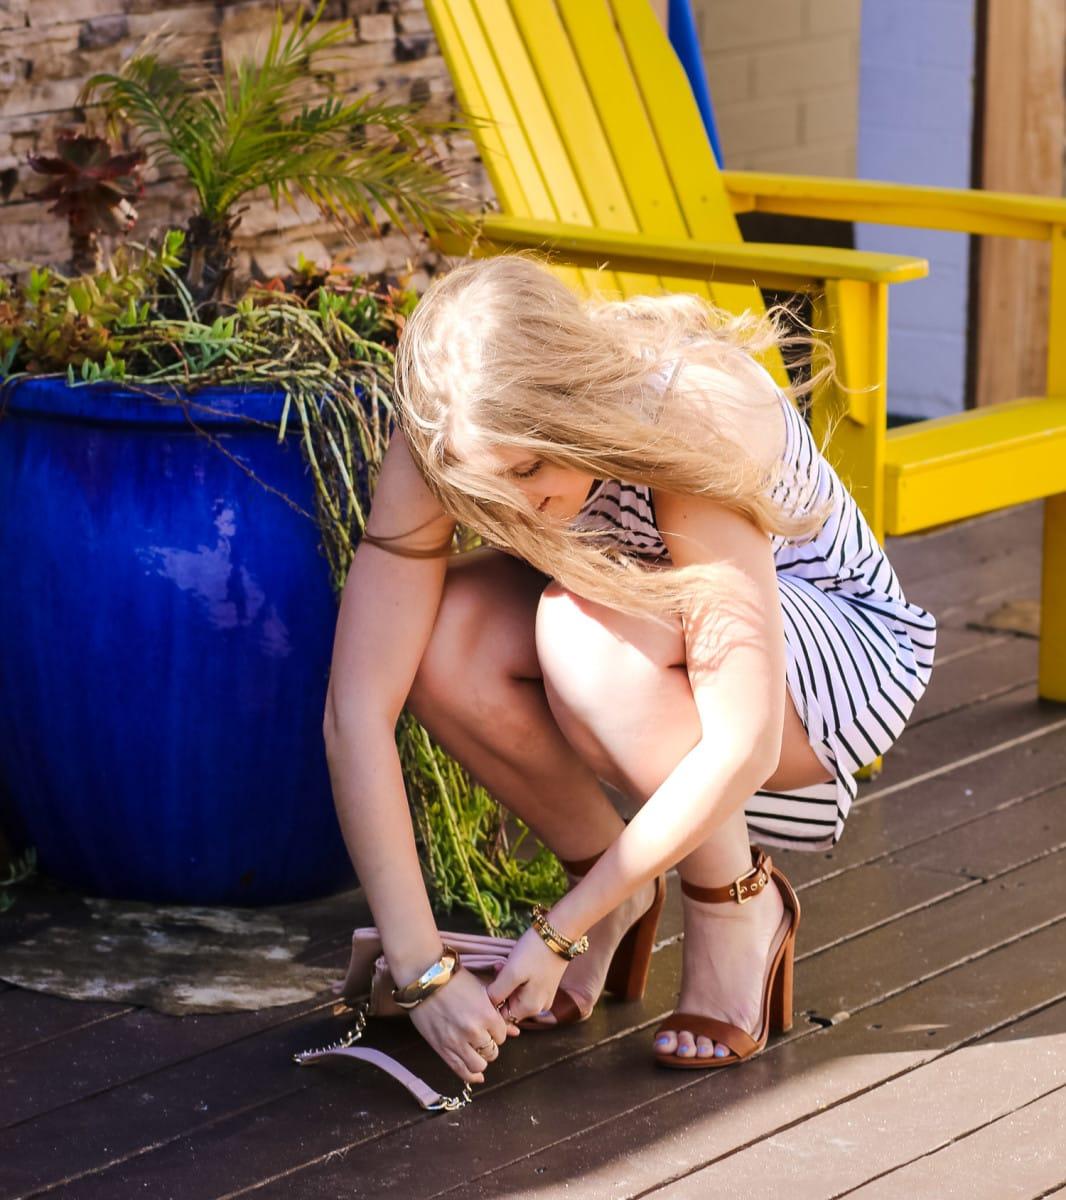 sheinside-striped-dress-pacific-edge-hotel-ashley-brooke-nicholas-quay-my-girl-sunglasses-0570